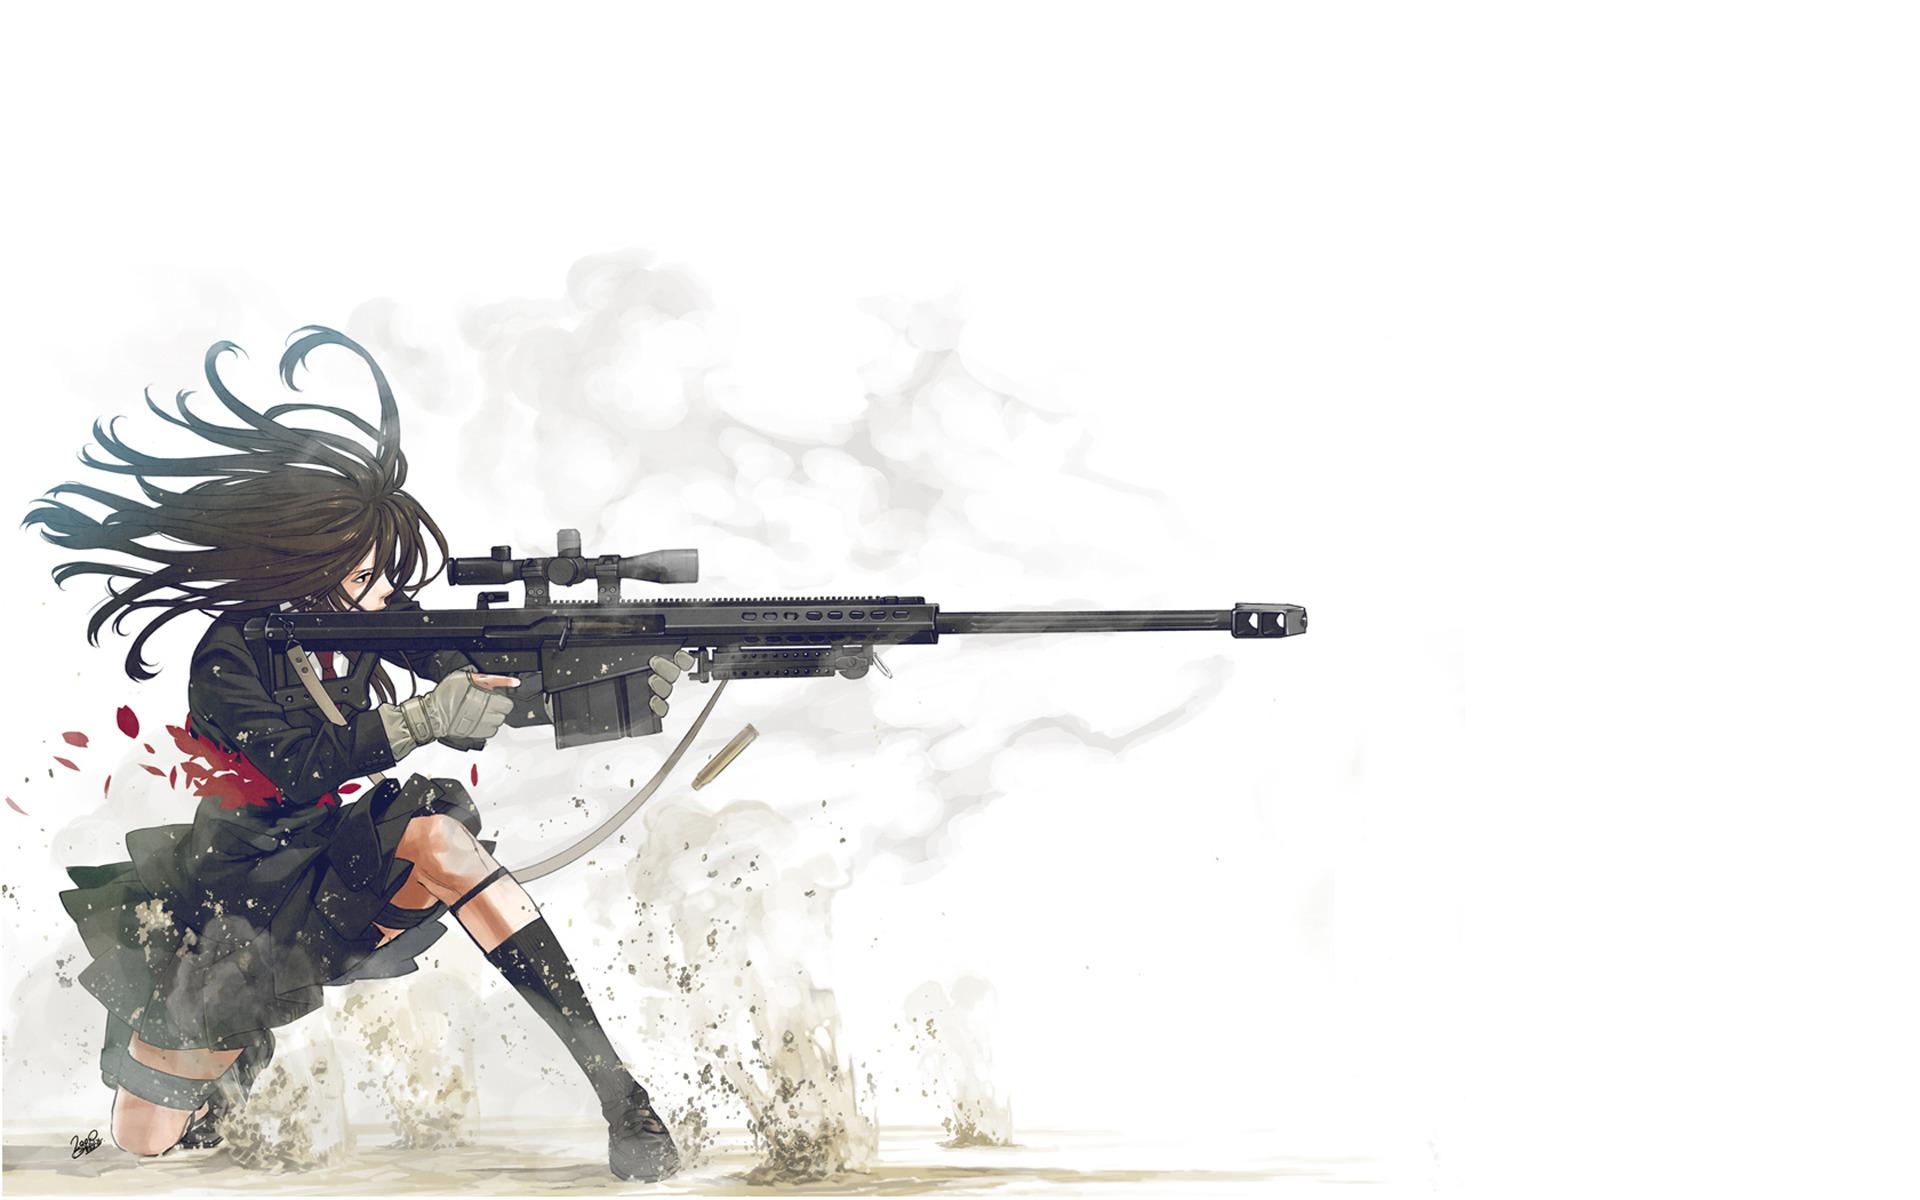 Drawn pistol sniper gun Wallpaper  Drawings Guns Sniper